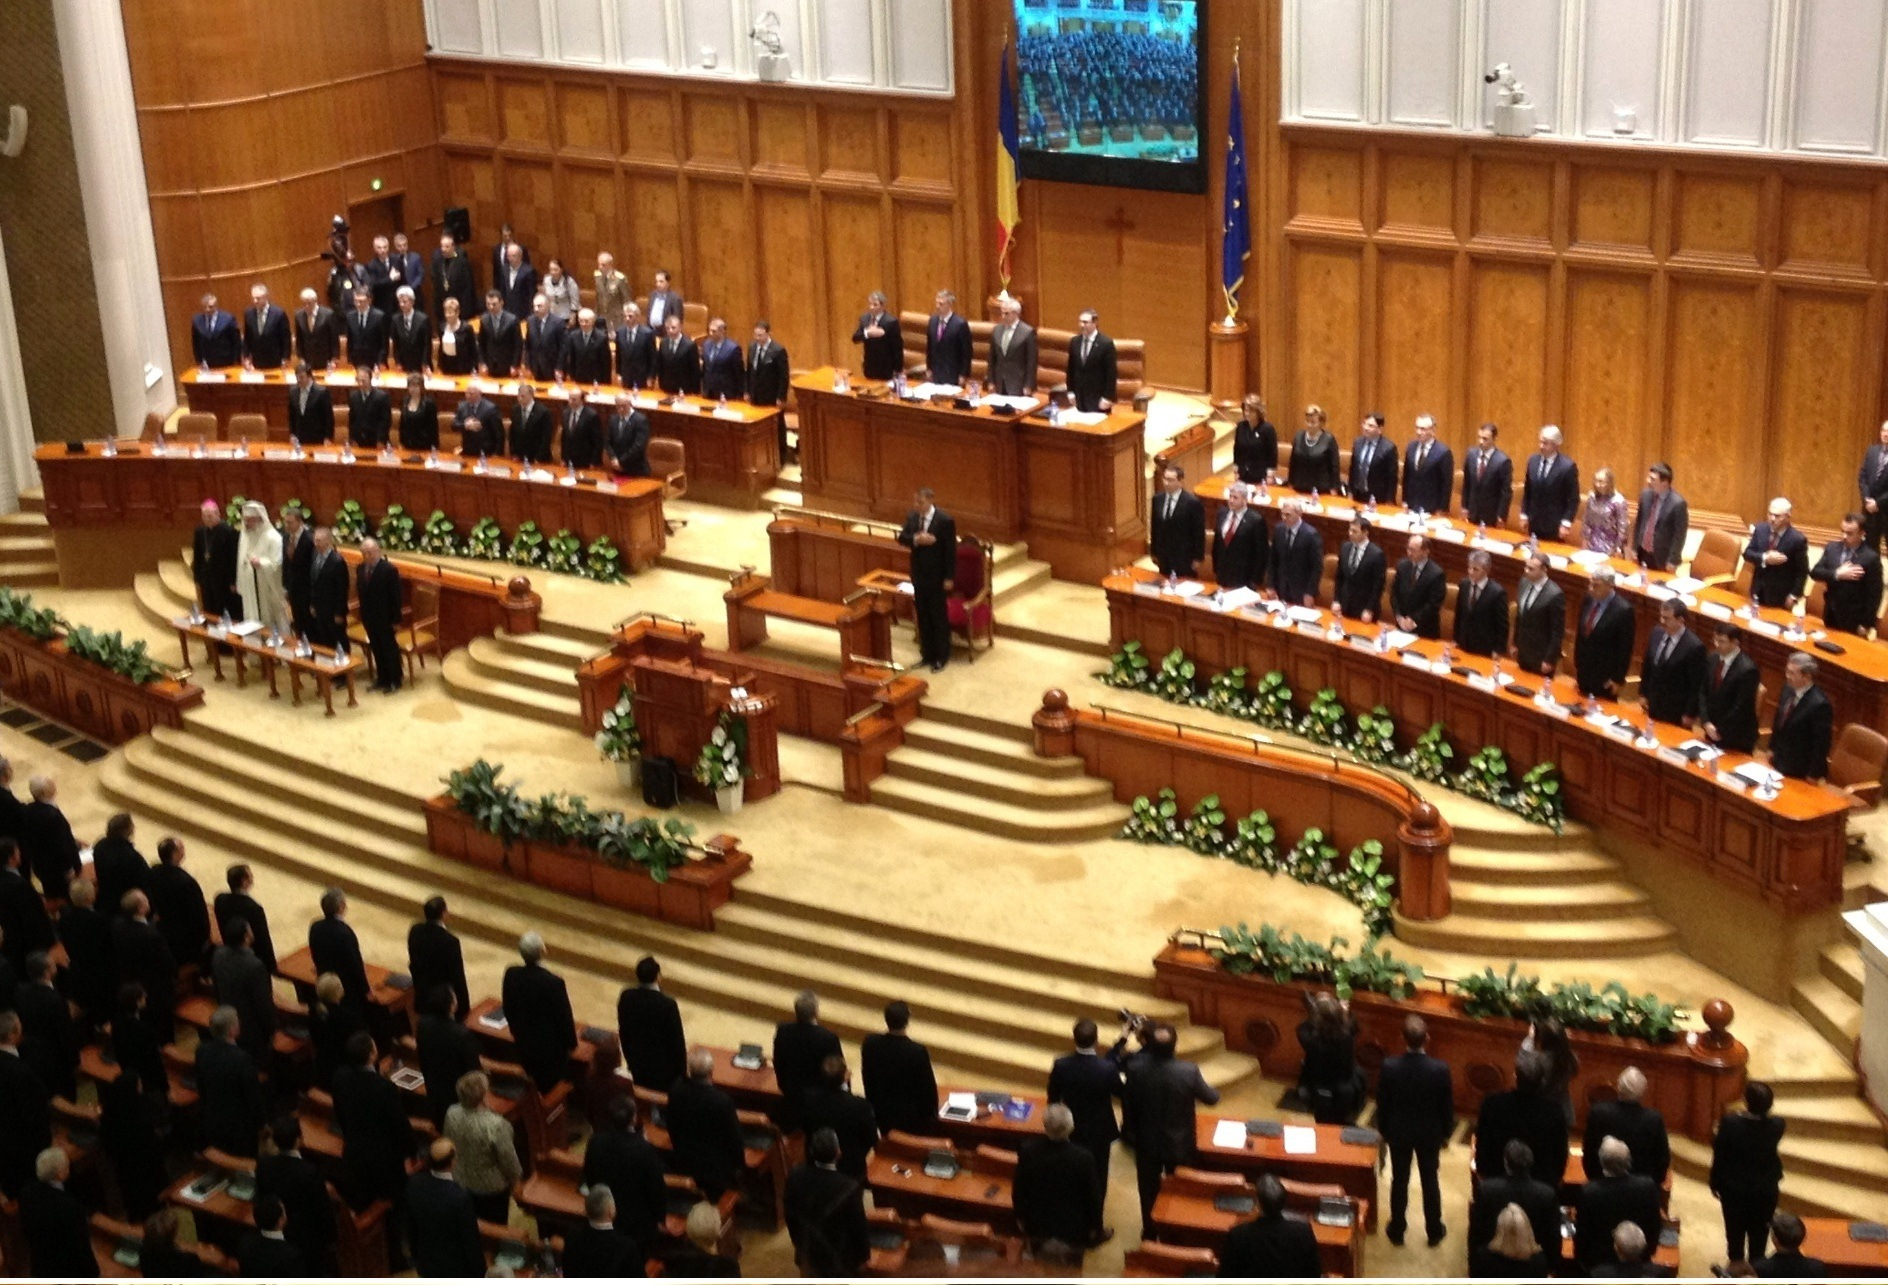 Primul an cu Iohannis: cat a tacut, cat a facut